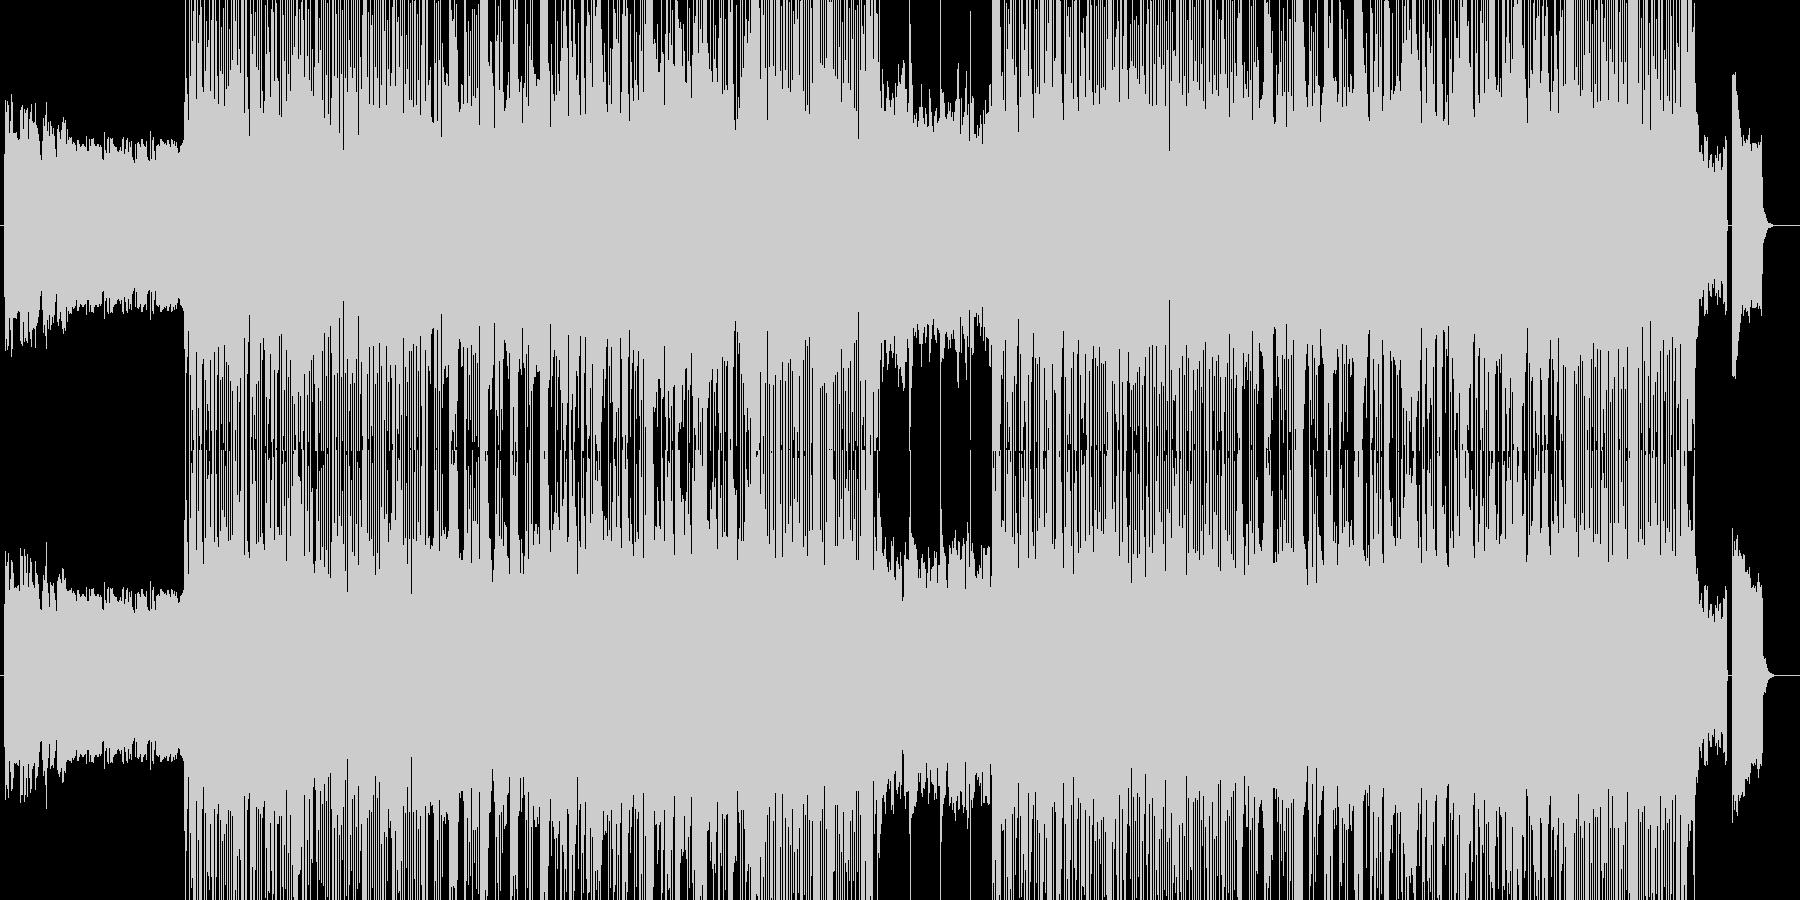 「HR/HM」「DARK」BGM205の未再生の波形